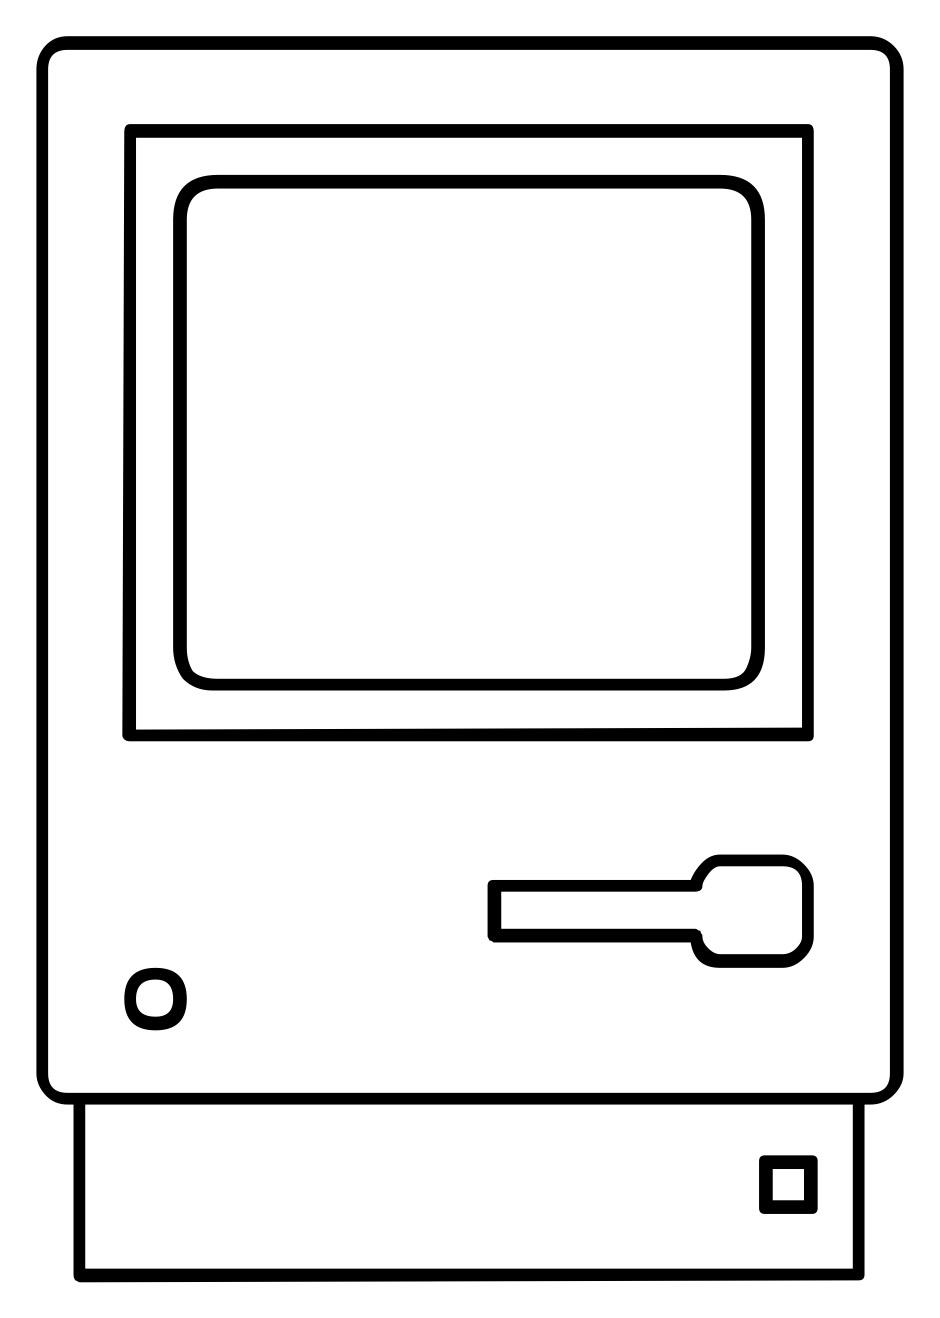 Macintosh 128K icon